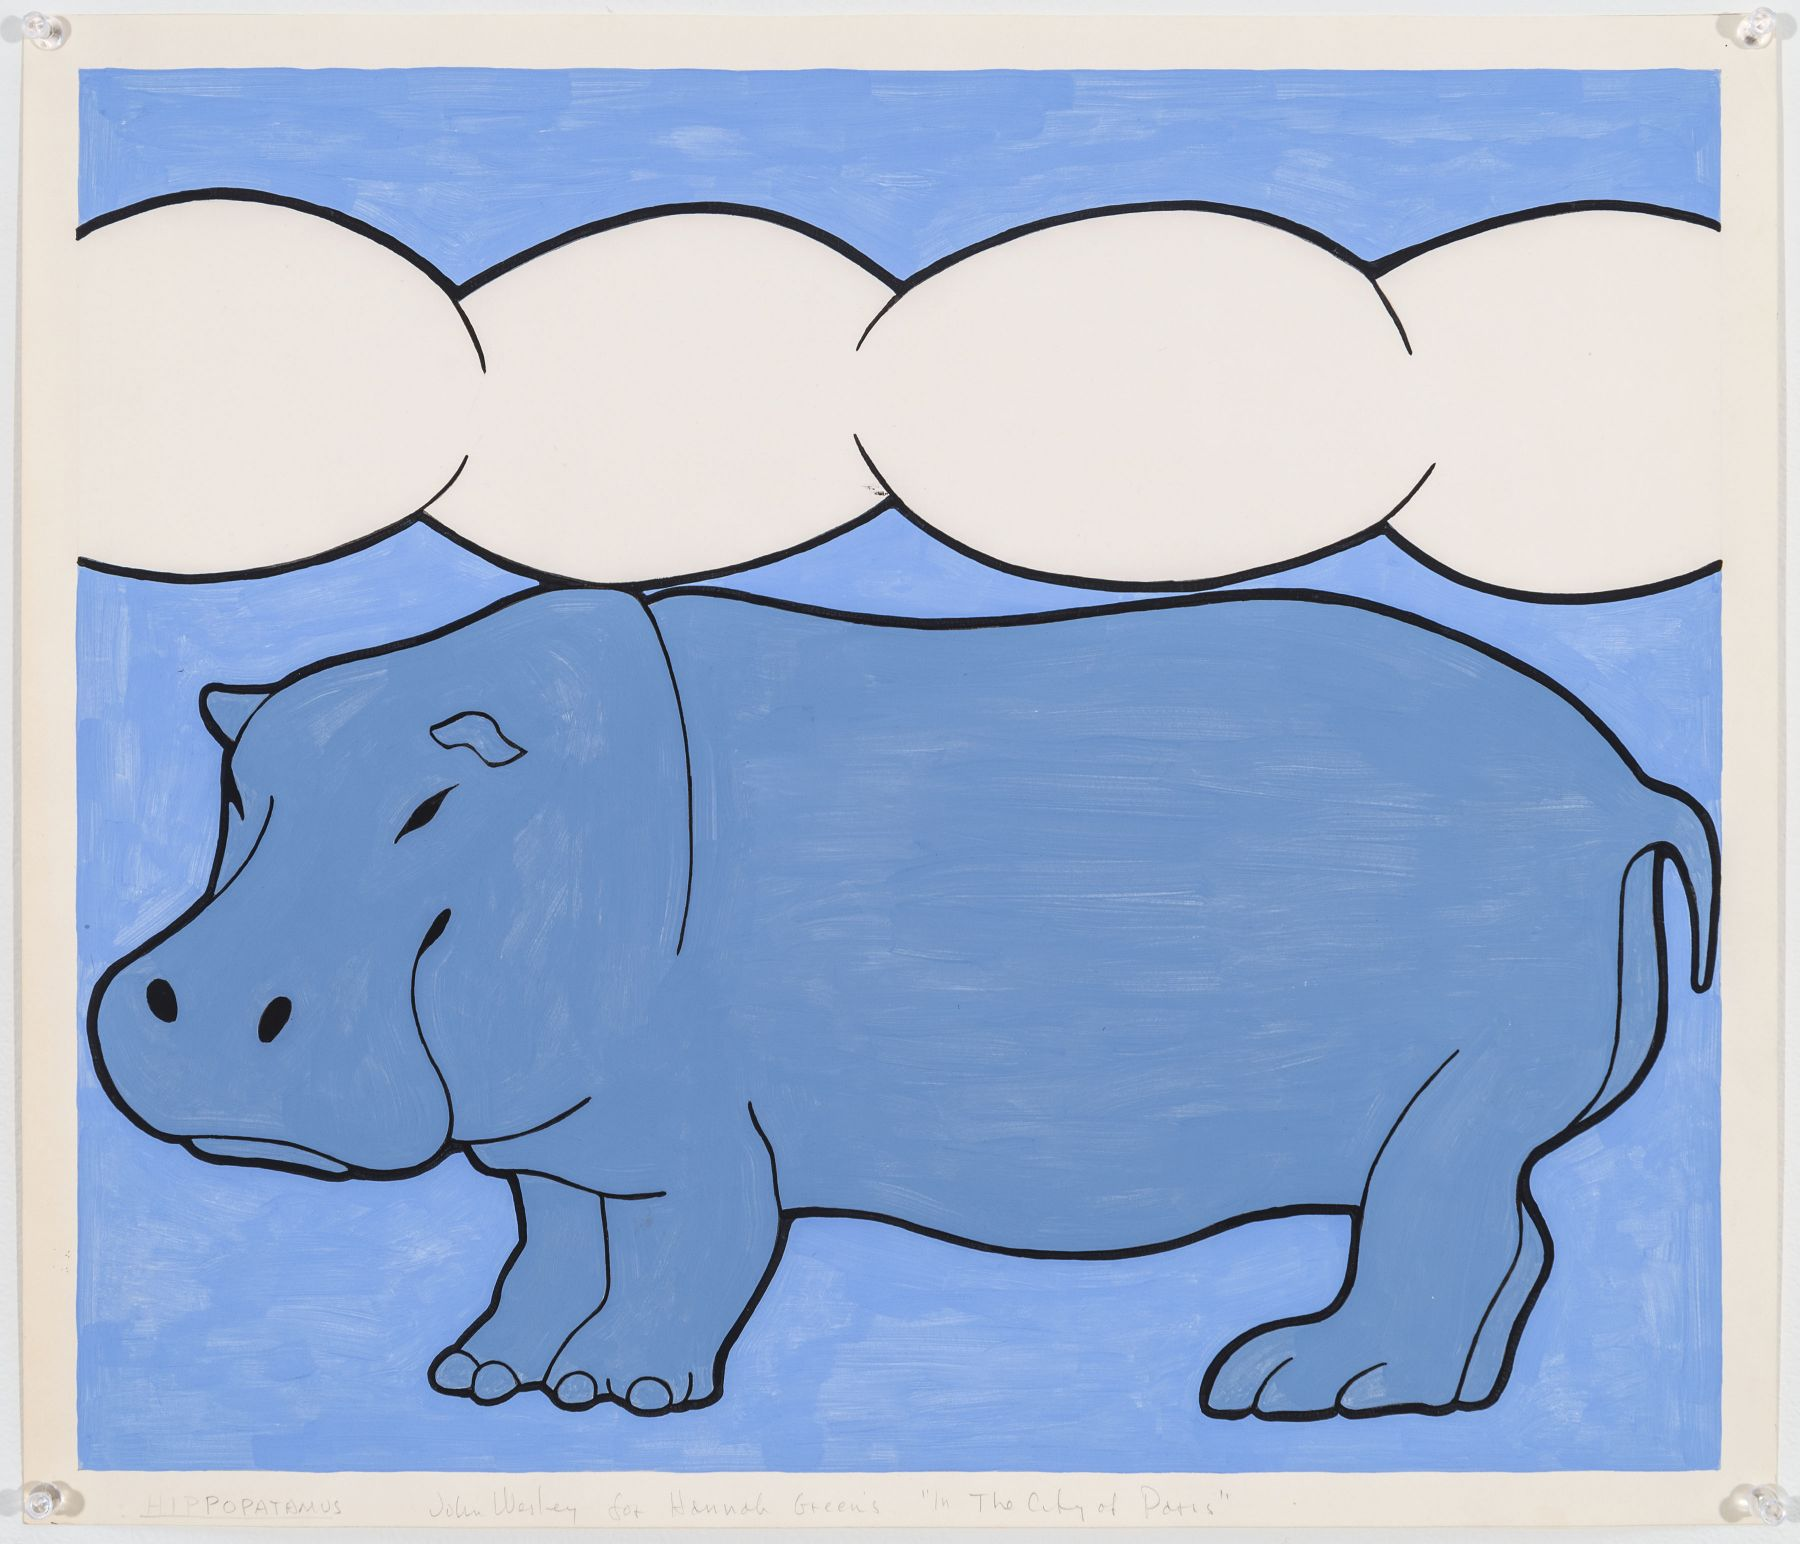 John Wesley, Hippopotamus, c. 1979